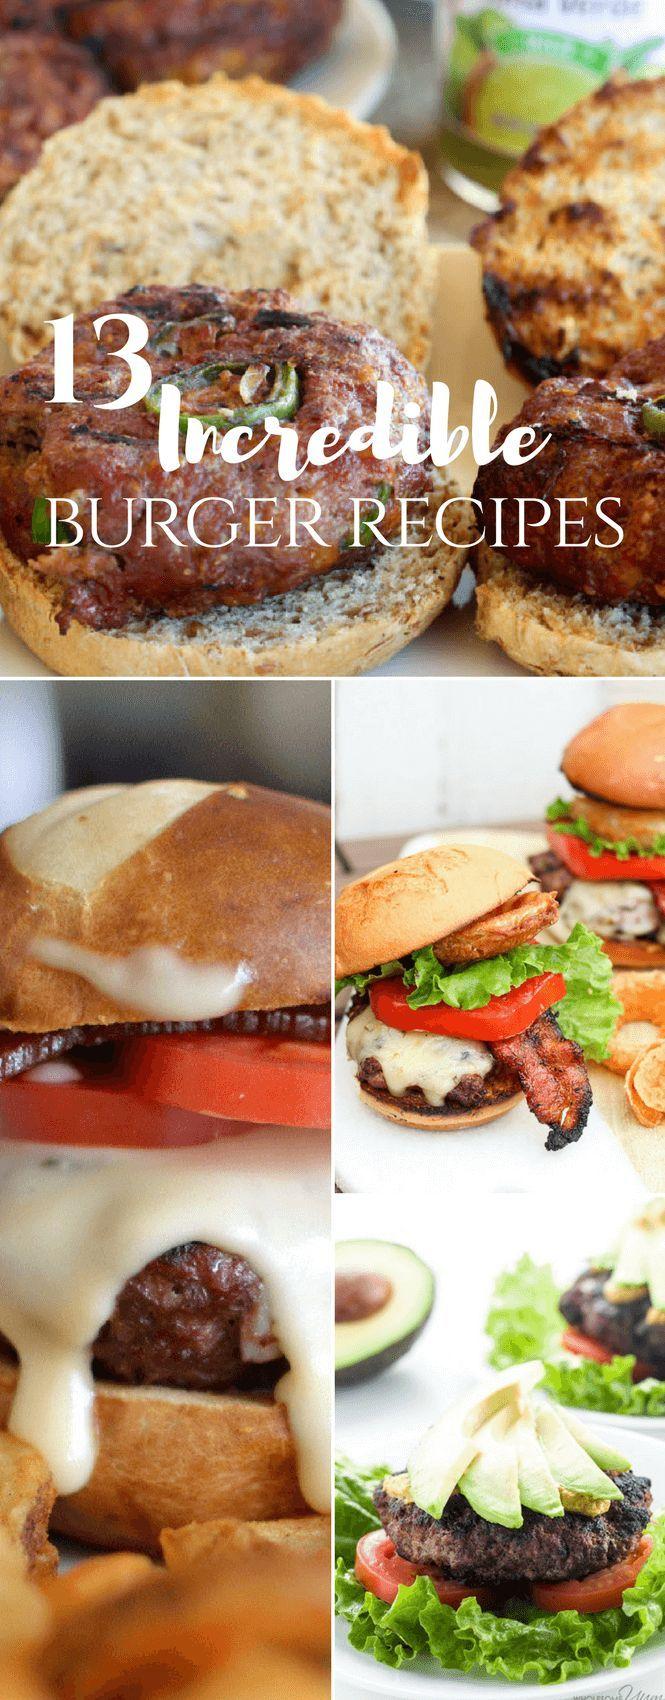 Incredible burger recipes